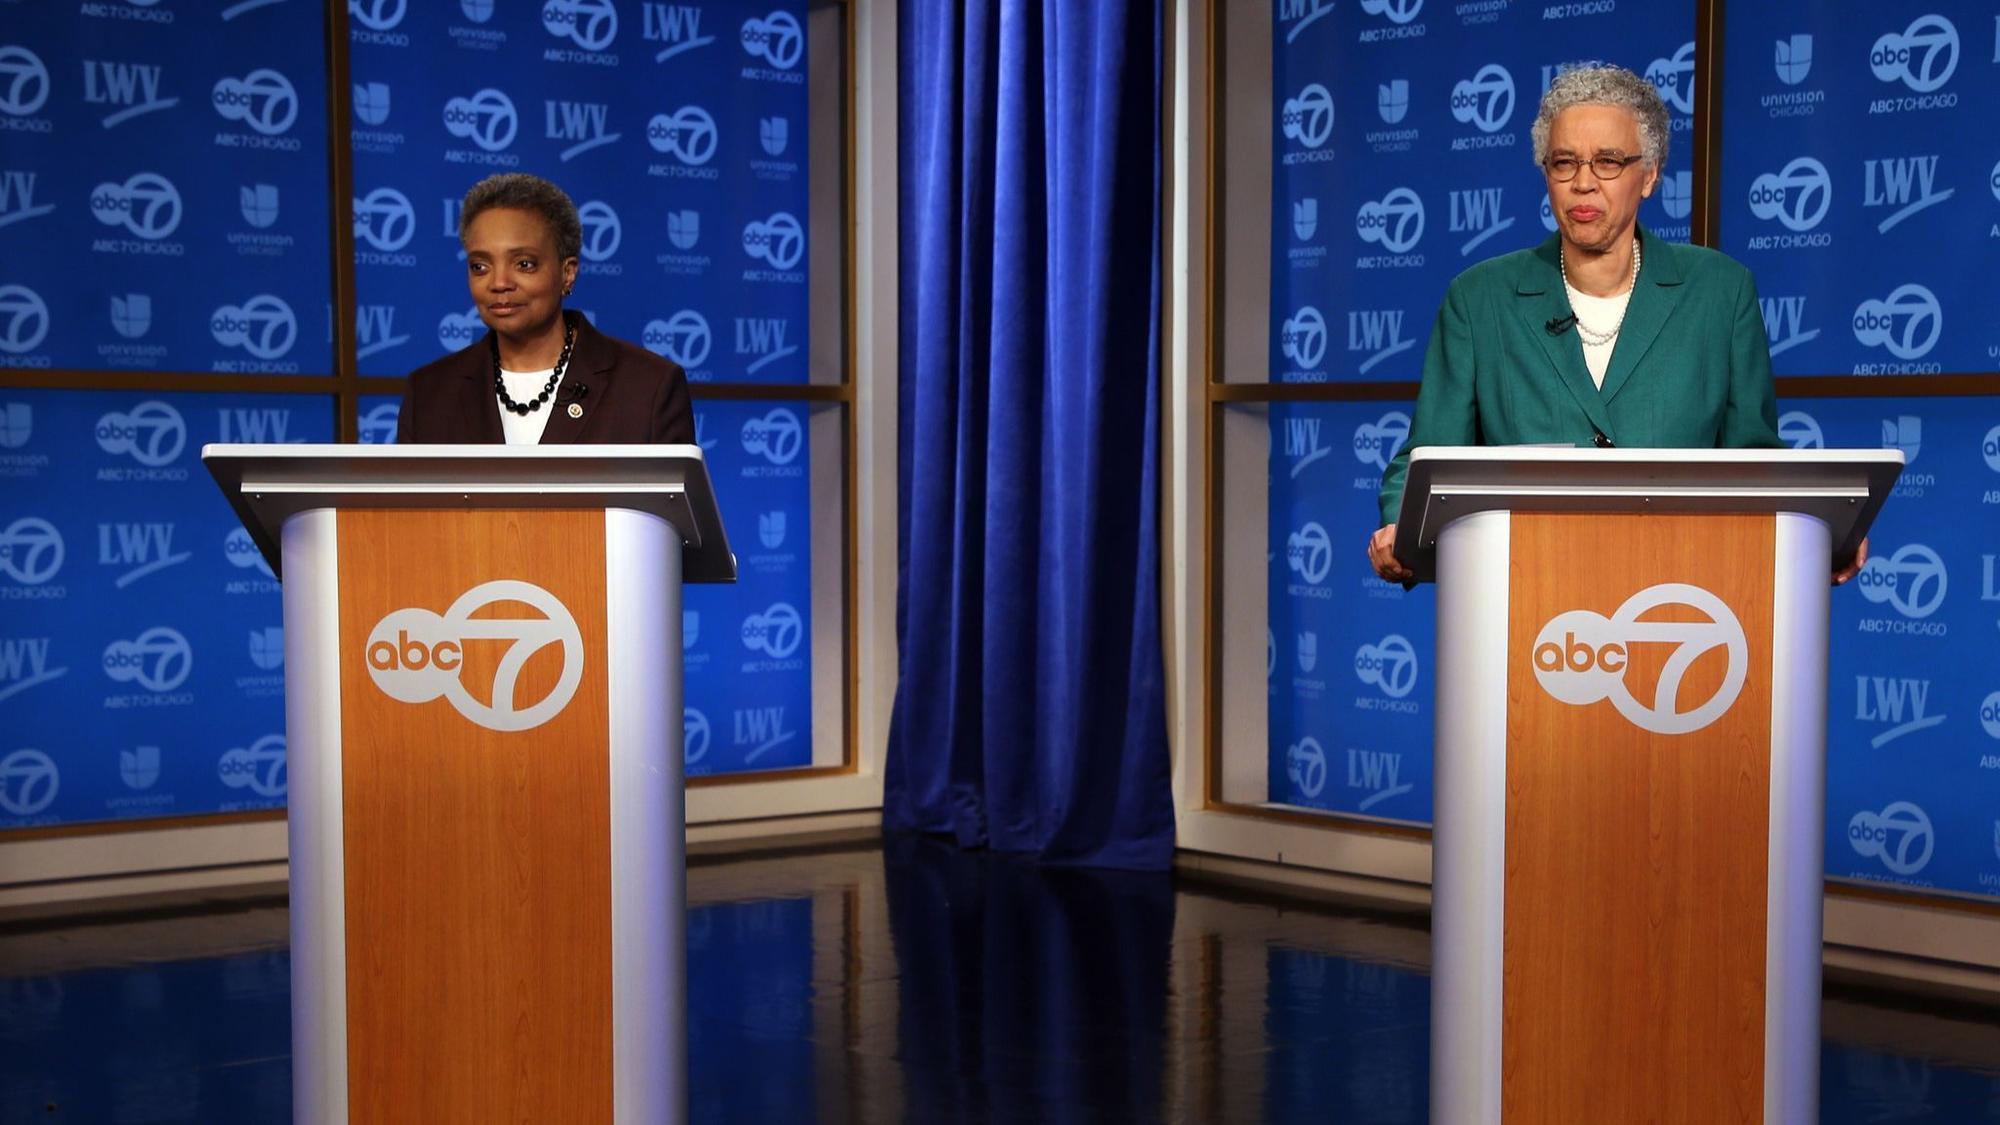 Telewizyjna debata kandydatek na burmistrza Chicago